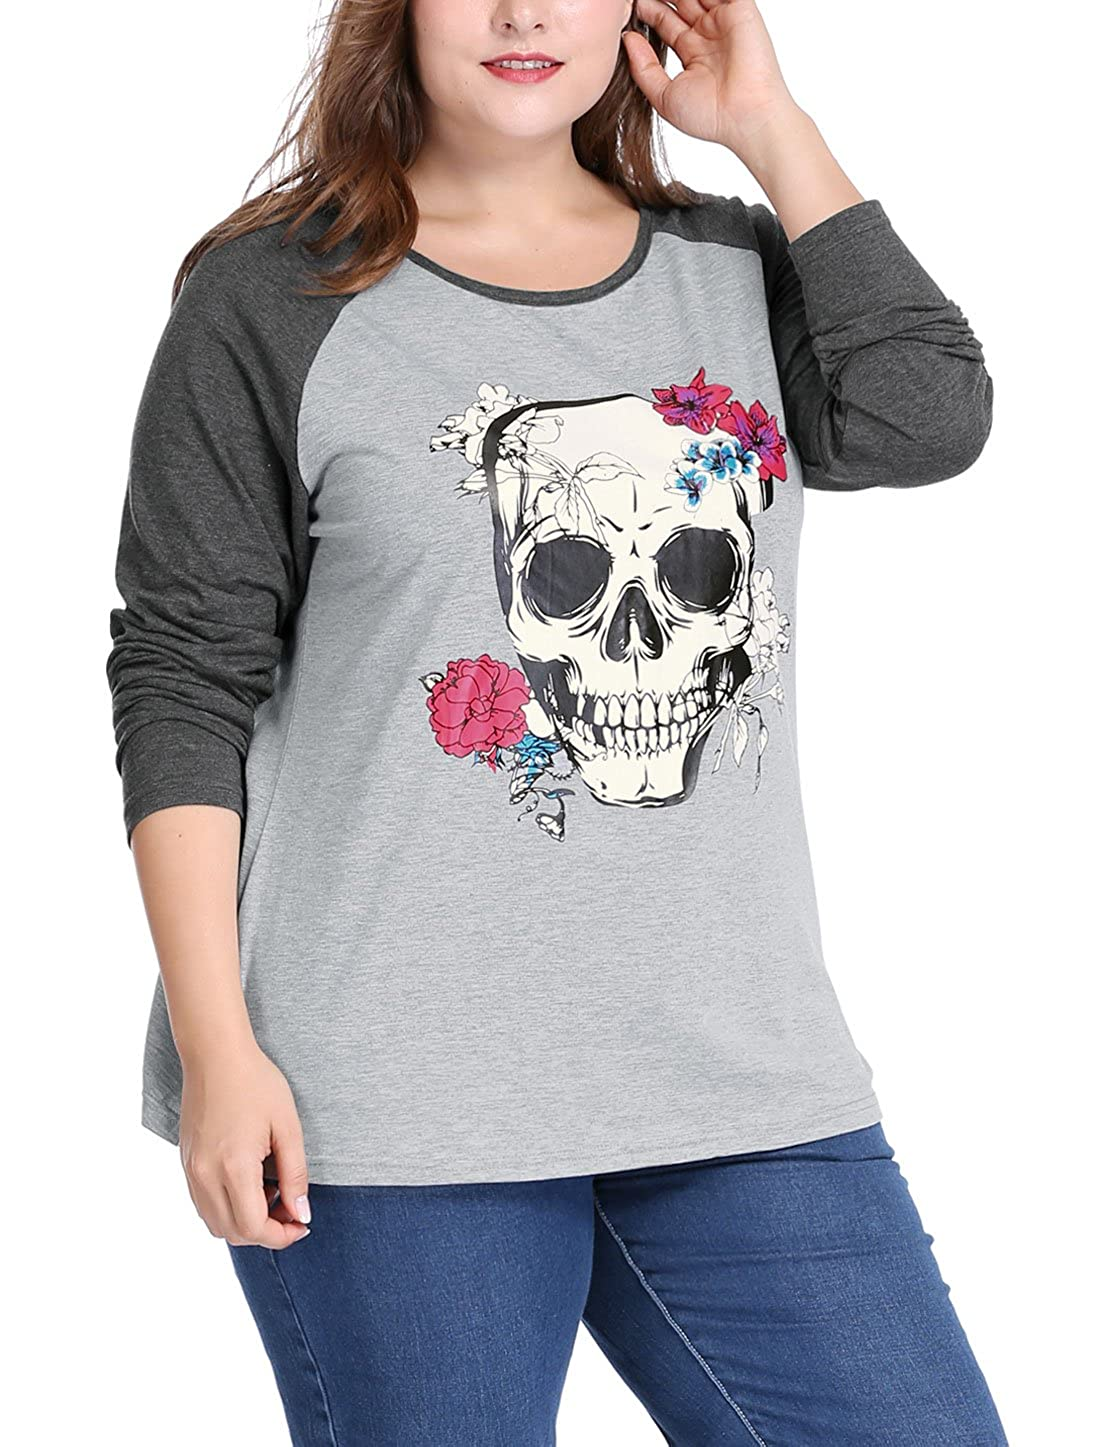 uxcell Women's Plus Size Floral Skull Contrast Color Raglan T-Shirt g16103100ux0012